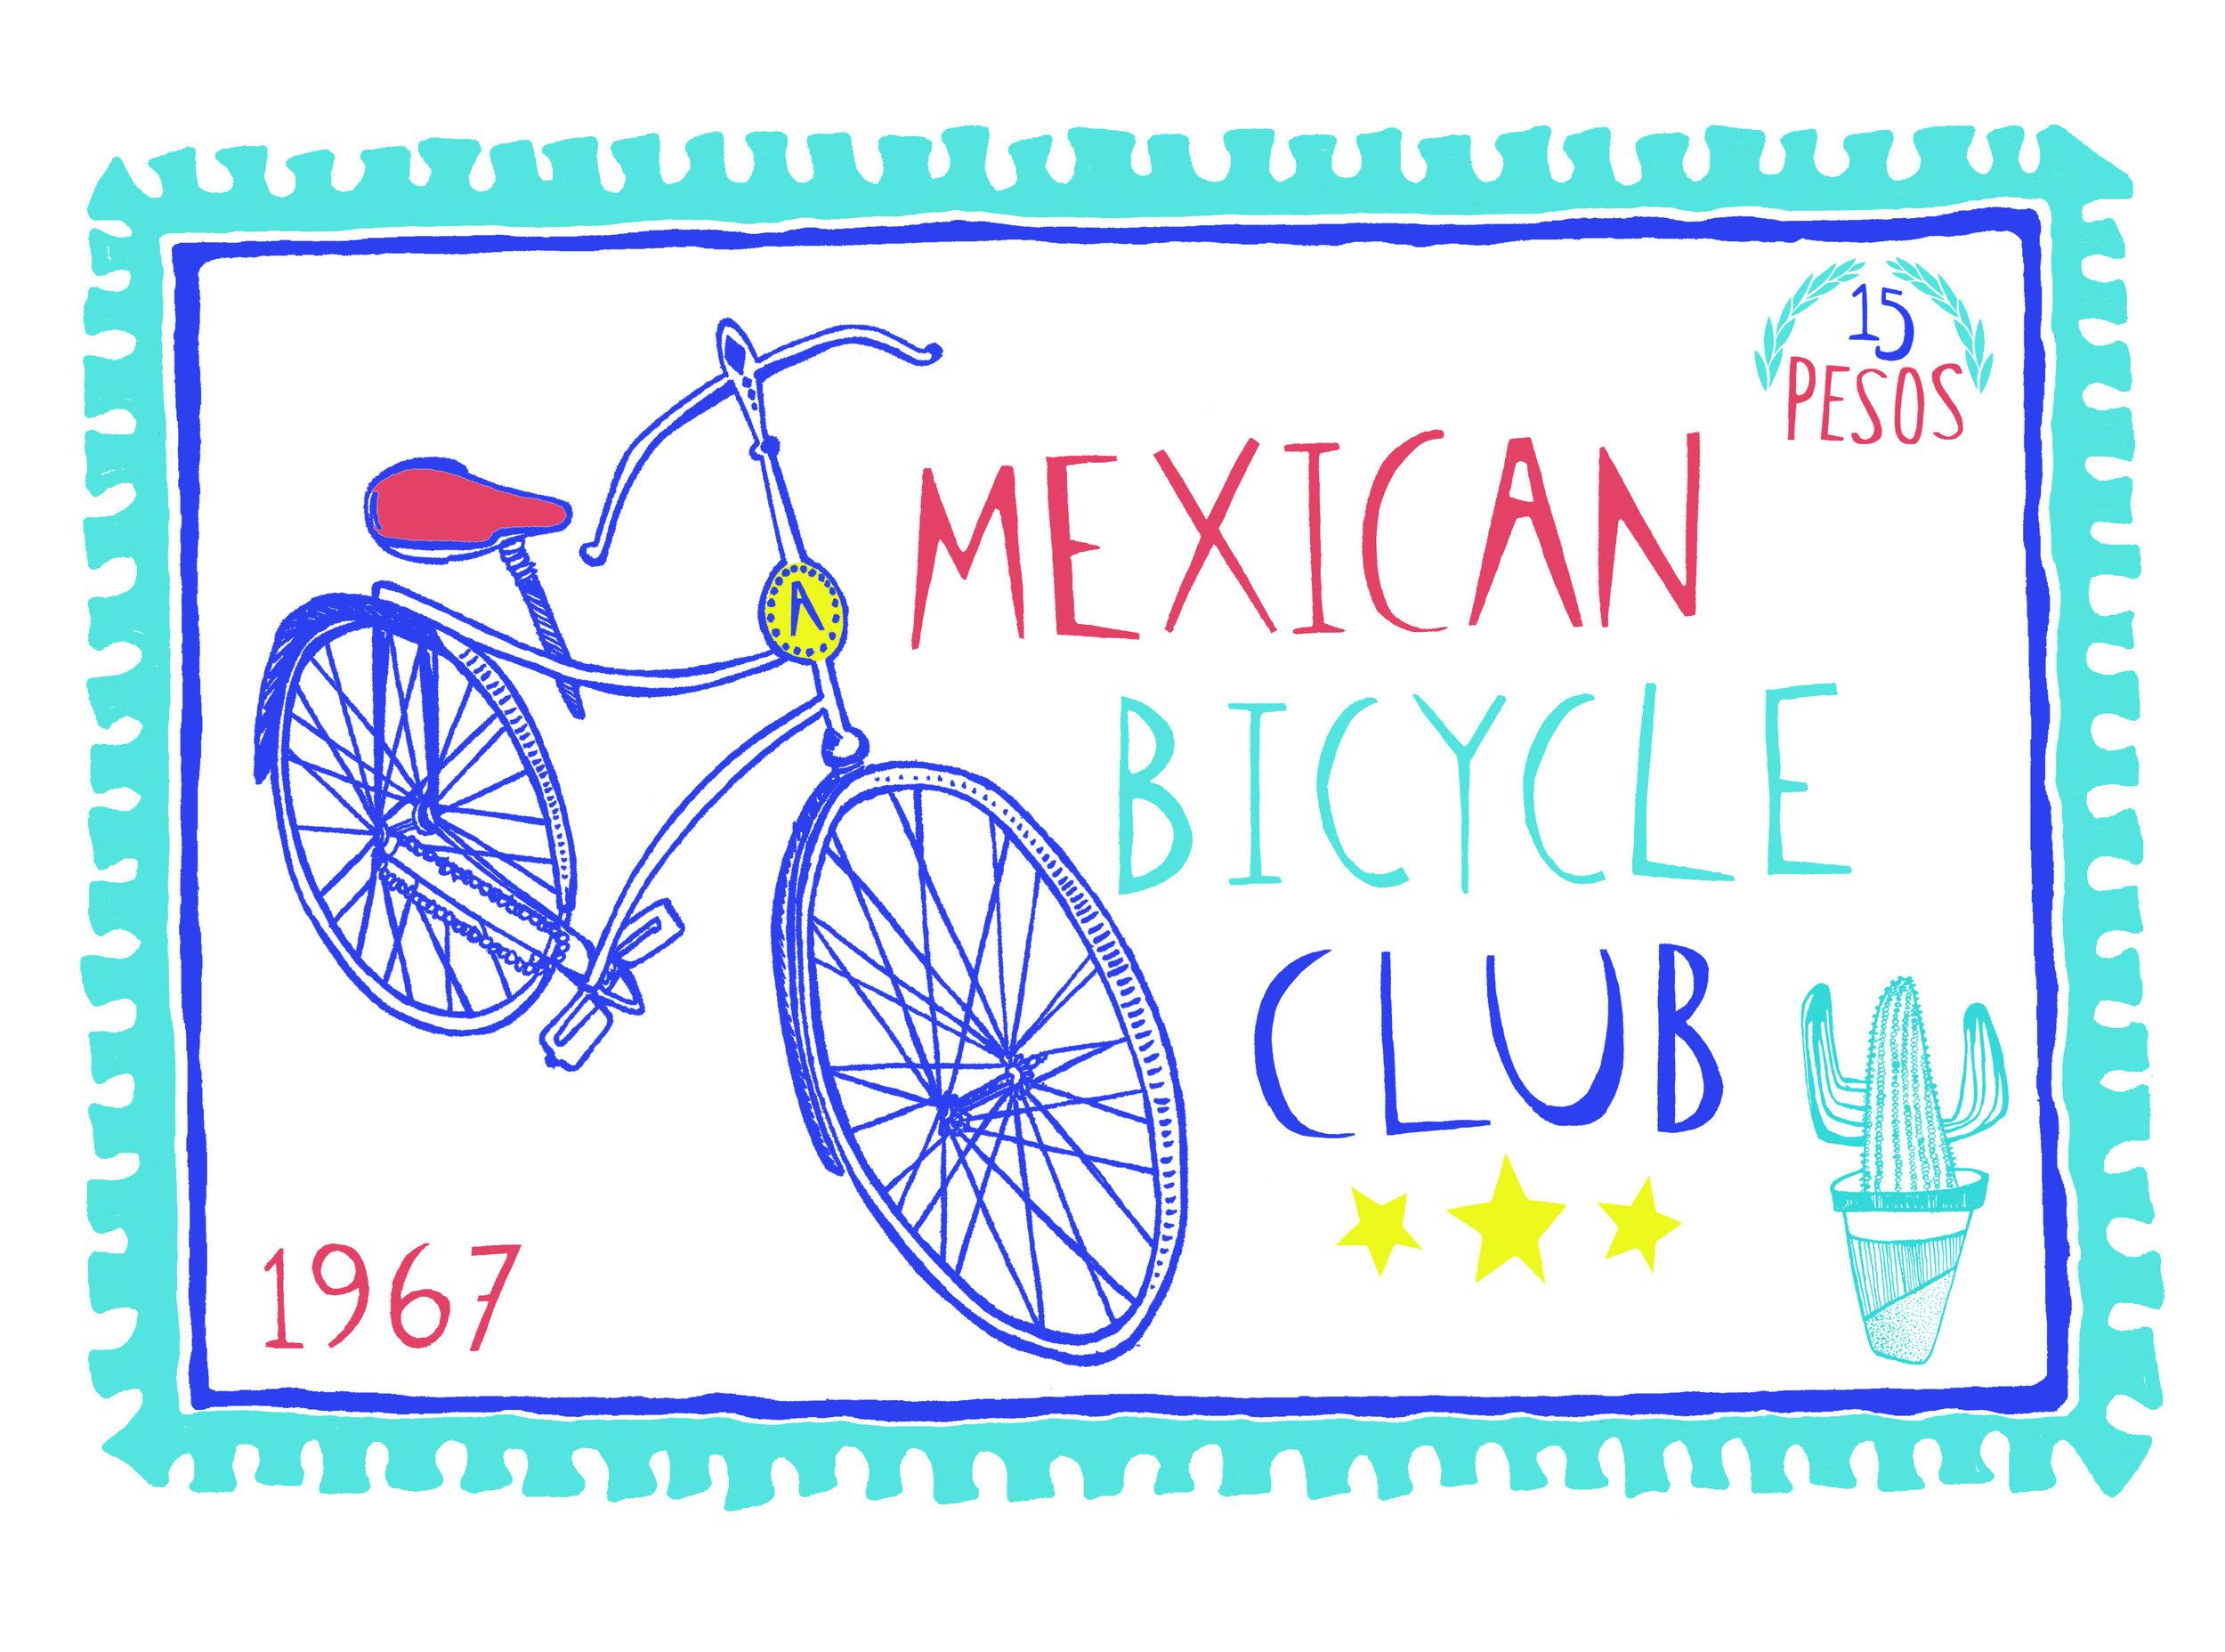 Mexican Bicycle Club.jpg